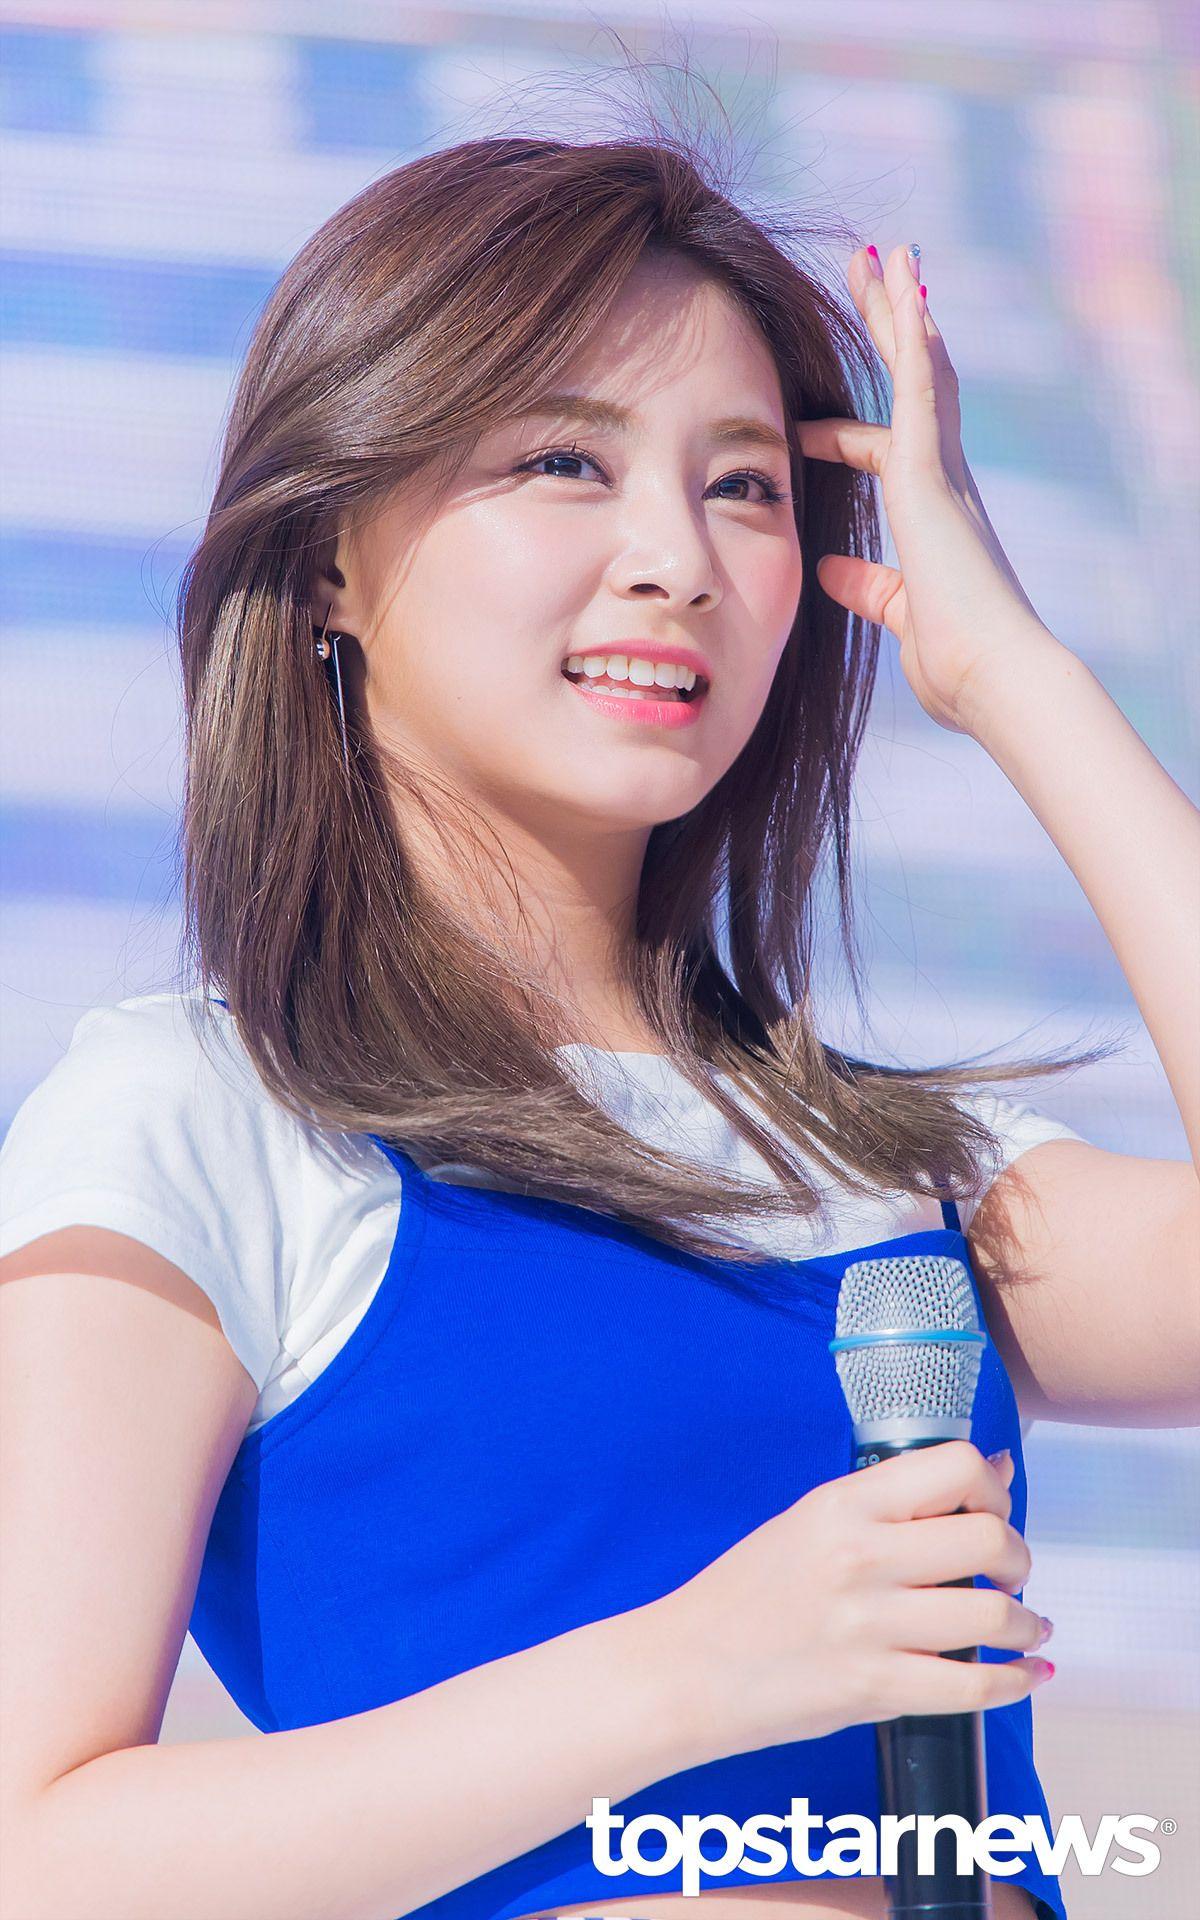 A Collection Of K Pop Idol Photos Current Faves Sana Wendy Irene Cheng Xiao Bona Jennie Kpop Girls Pop Idol Model